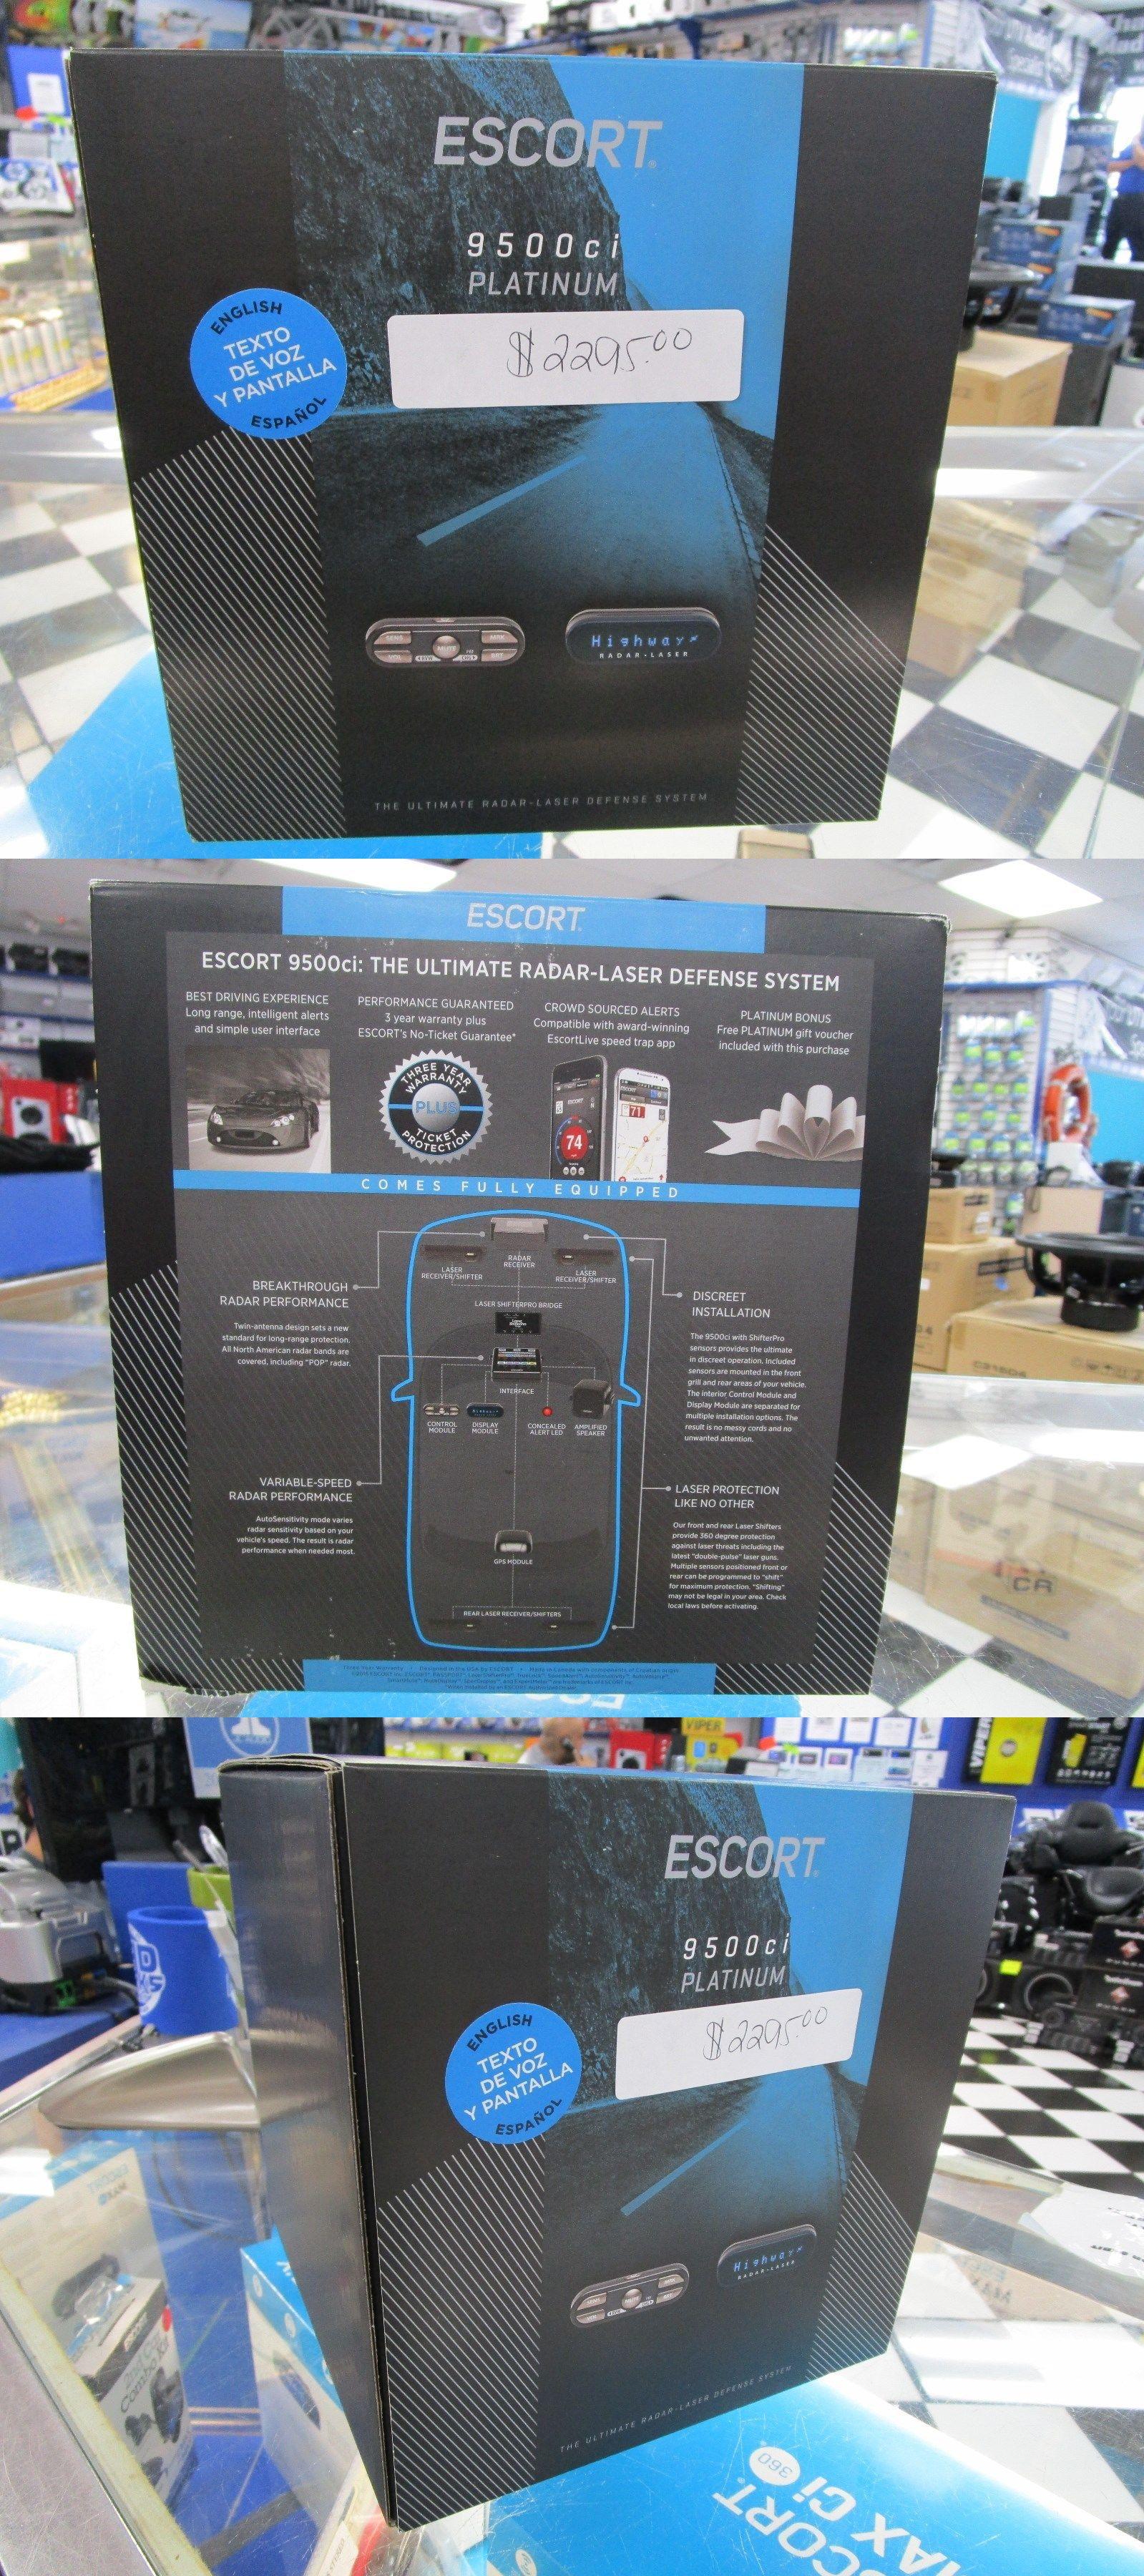 "Radar and Laser Detectors: Escort Passport 9500Ci-Platinum Radar Detector W  4) Laser Shifter Pro Brand New -> BUY IT NOW ONLY: $1699.95 on eBay!""/></a></p> <h2>Film Radar Projection</h2> <p><iframe height=481 width=608 src="